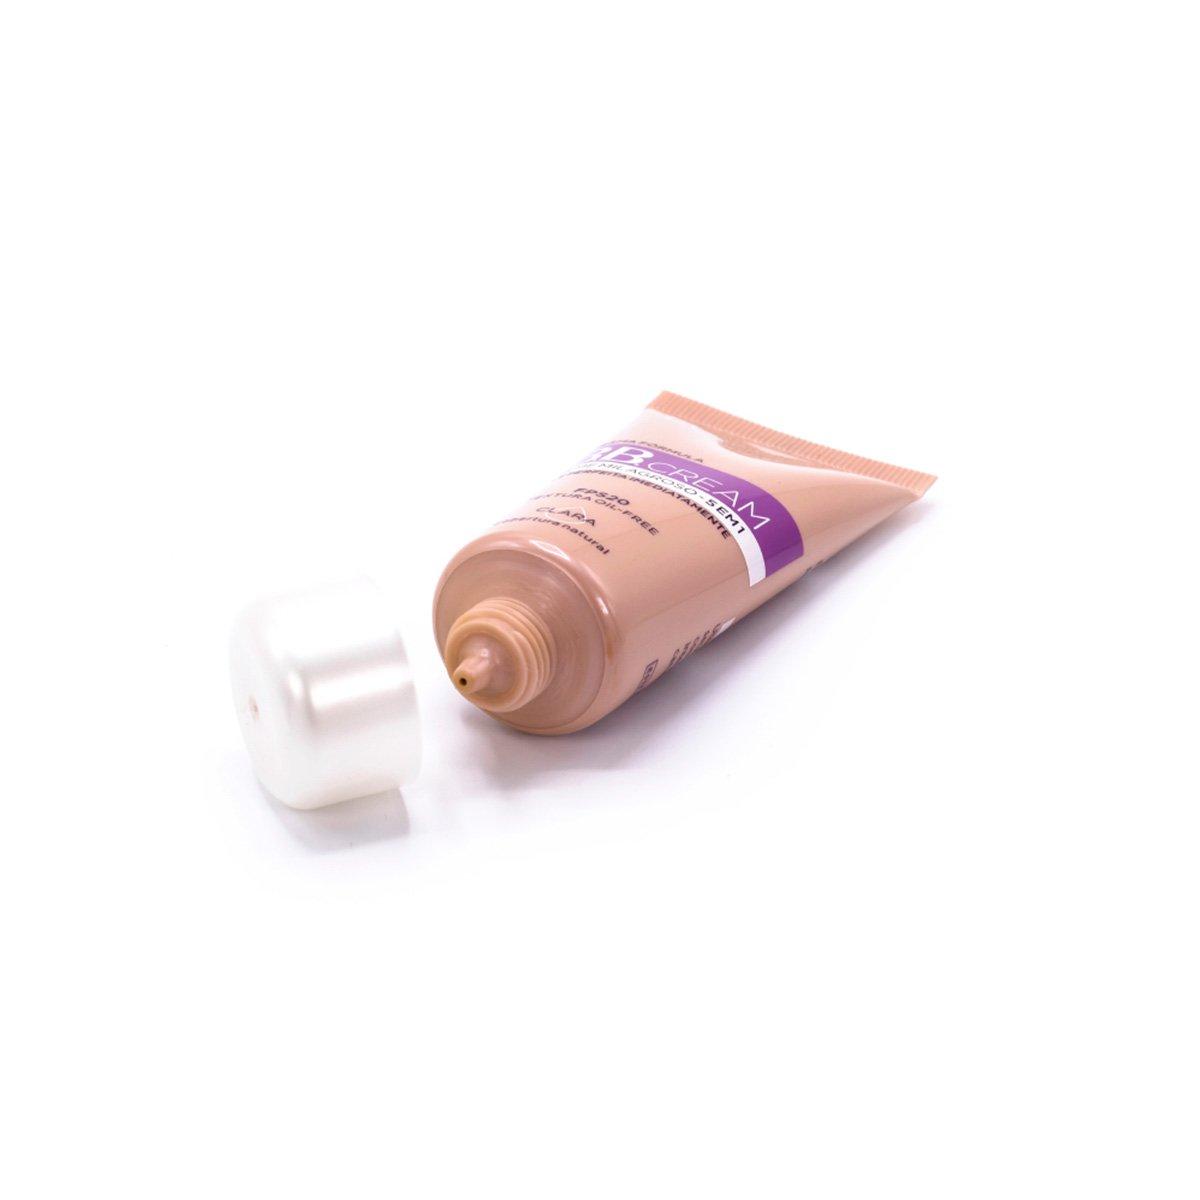 BB Cream L'Oréal Paris cor Clara FPS 20 30ml - 3